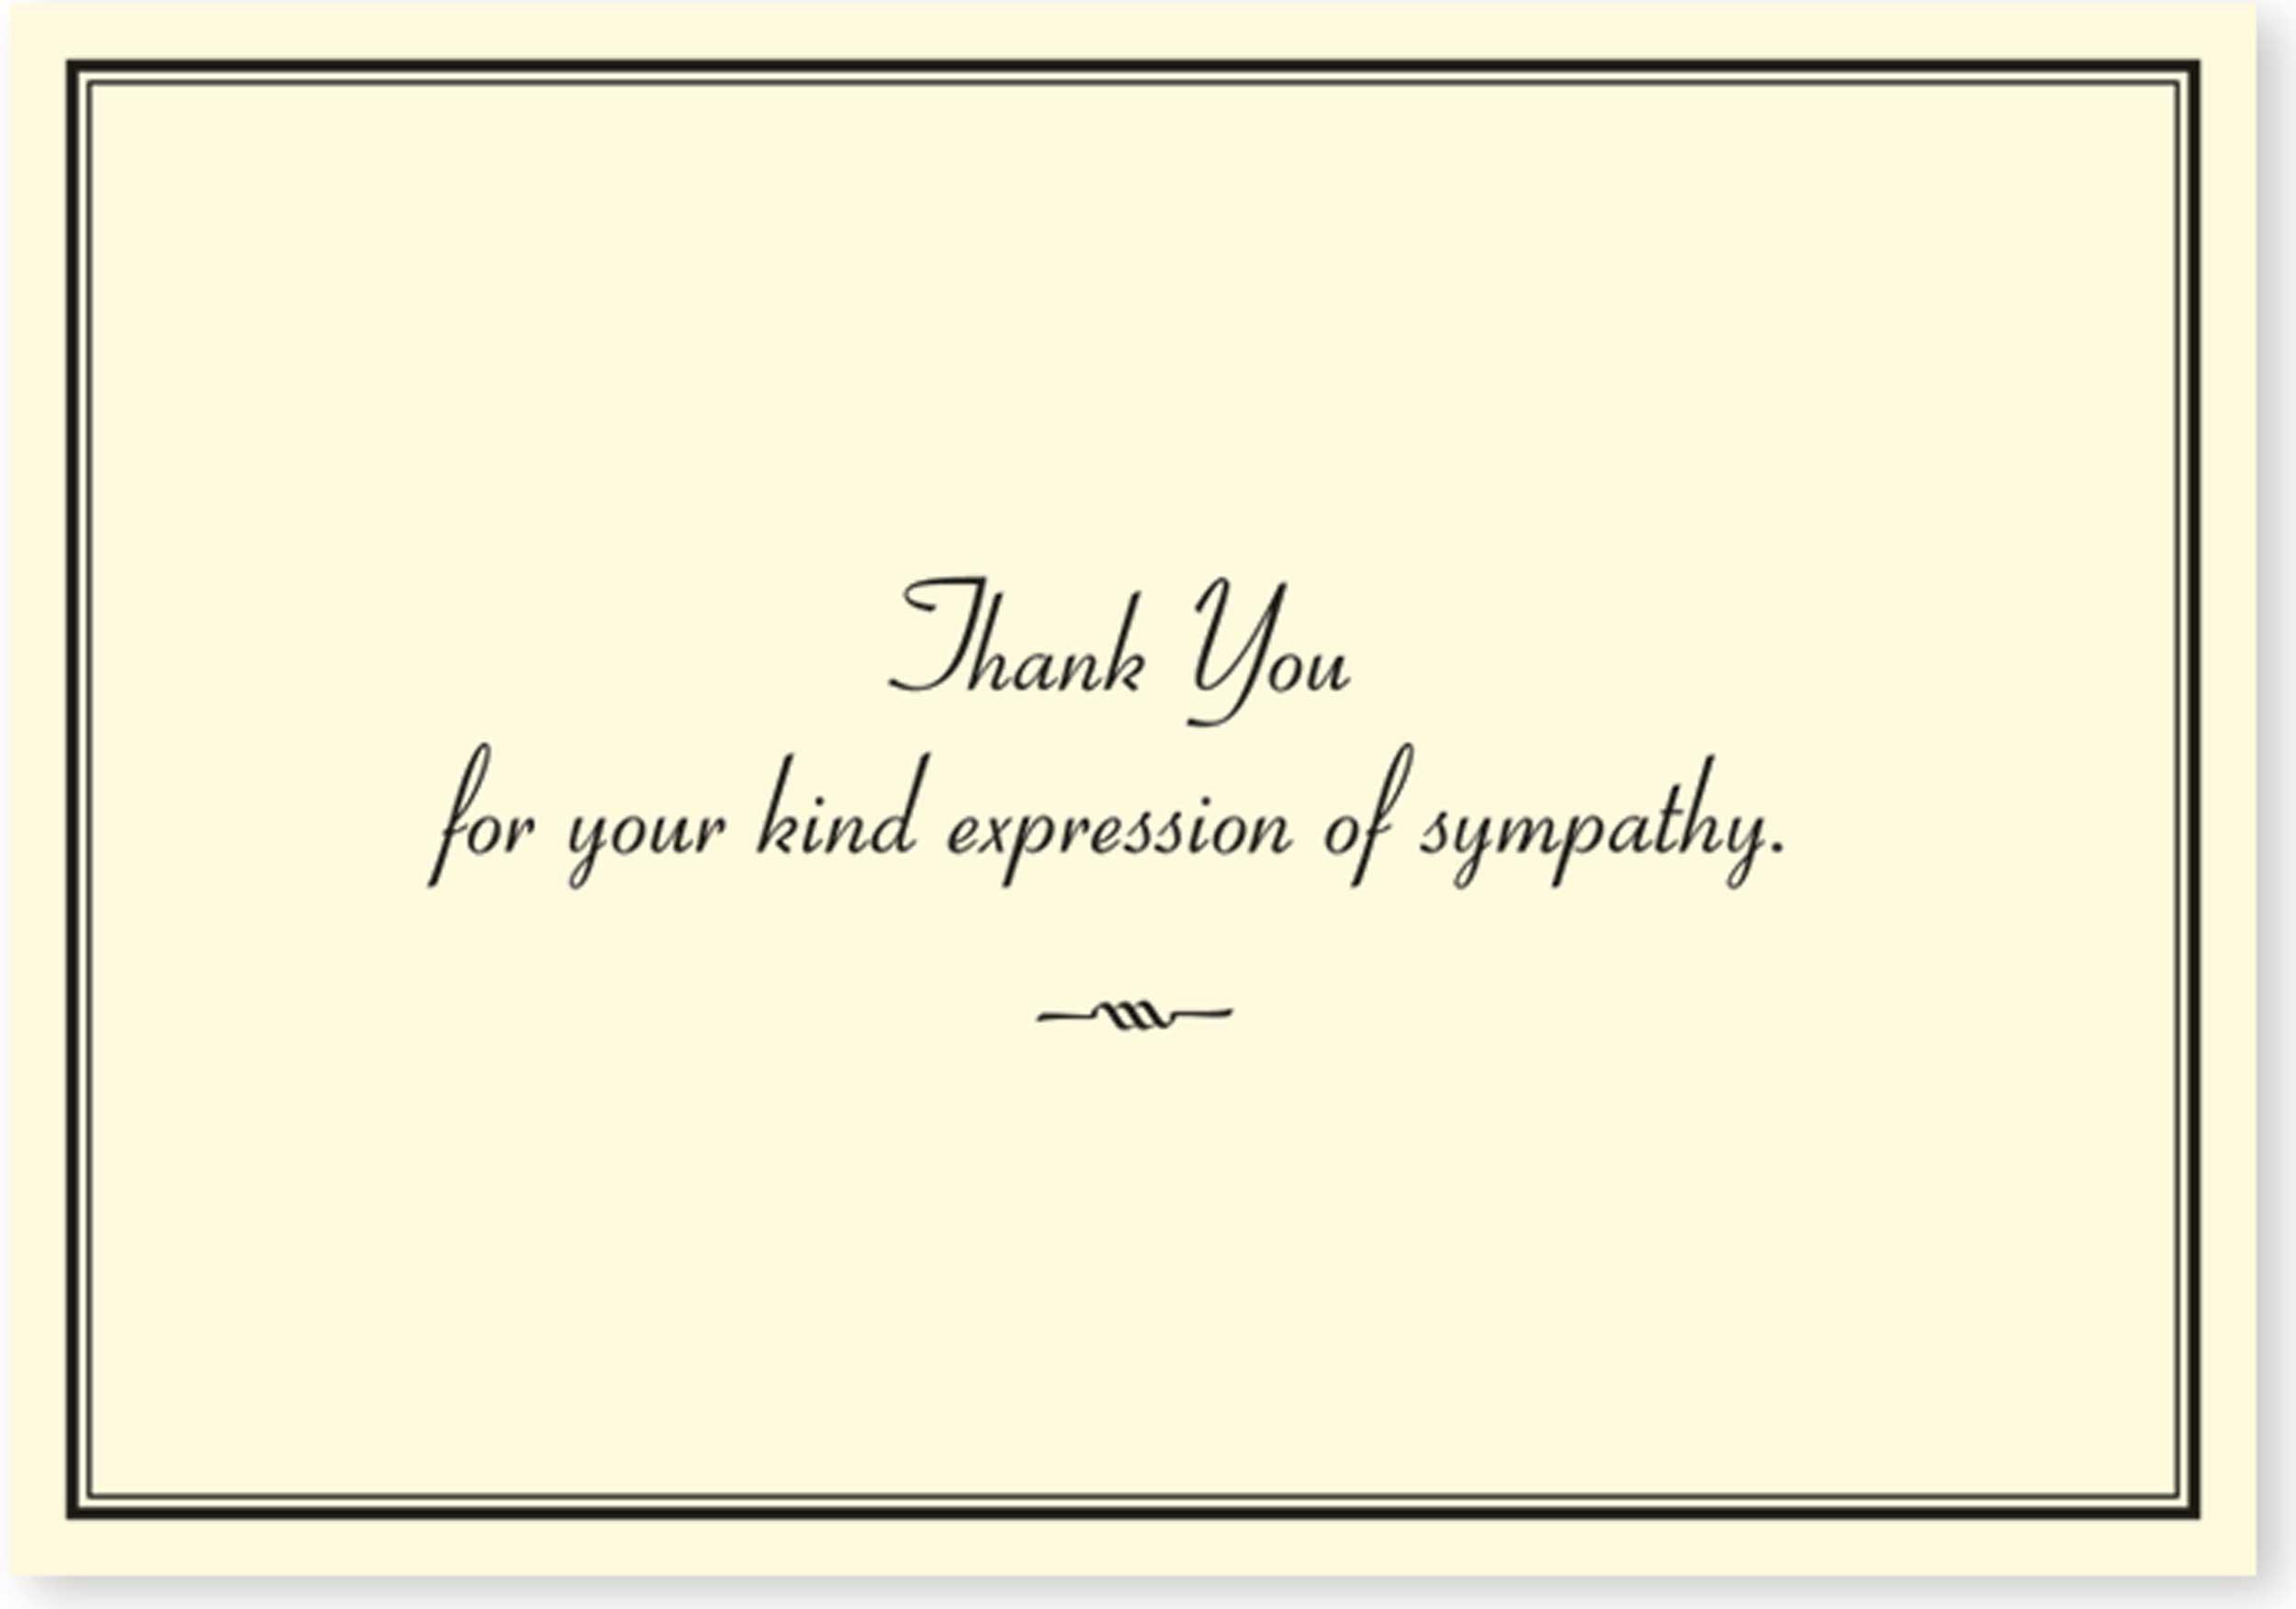 Sympathy thank you notes walmart izmirmasajfo Choice Image